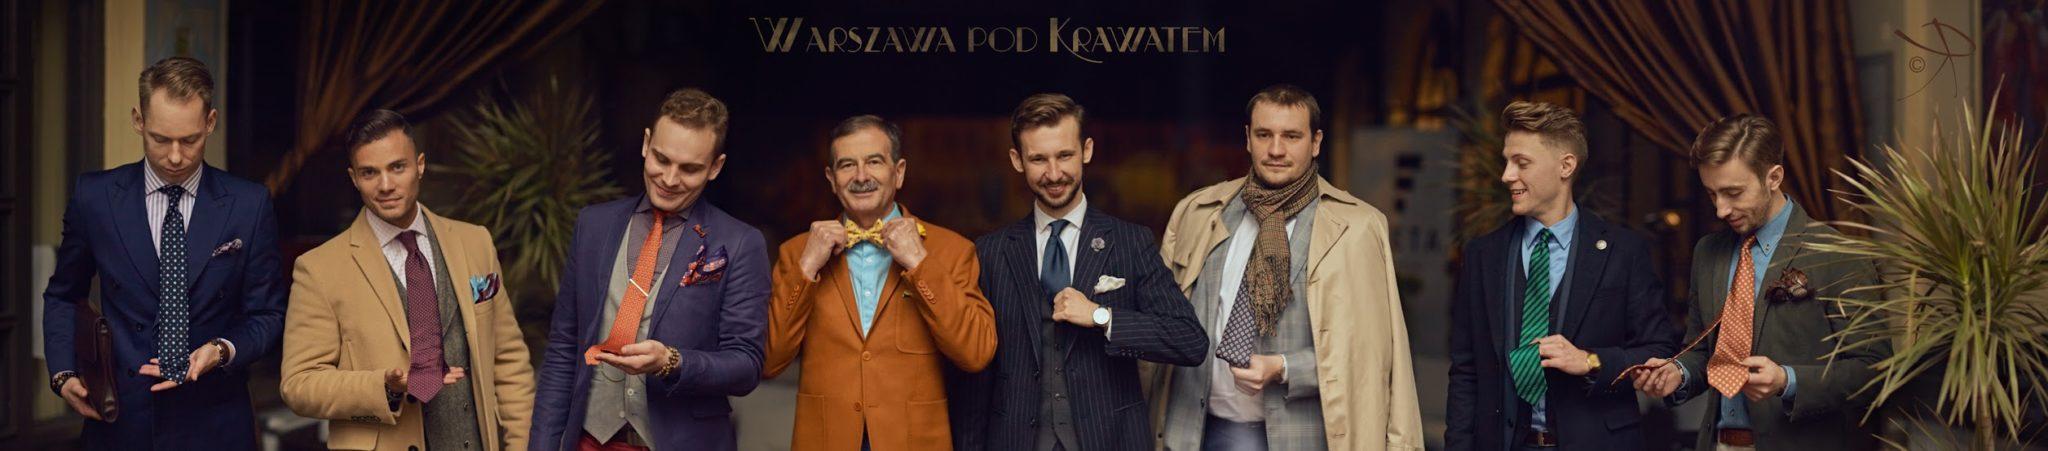 Warszawa pod krawatem 3